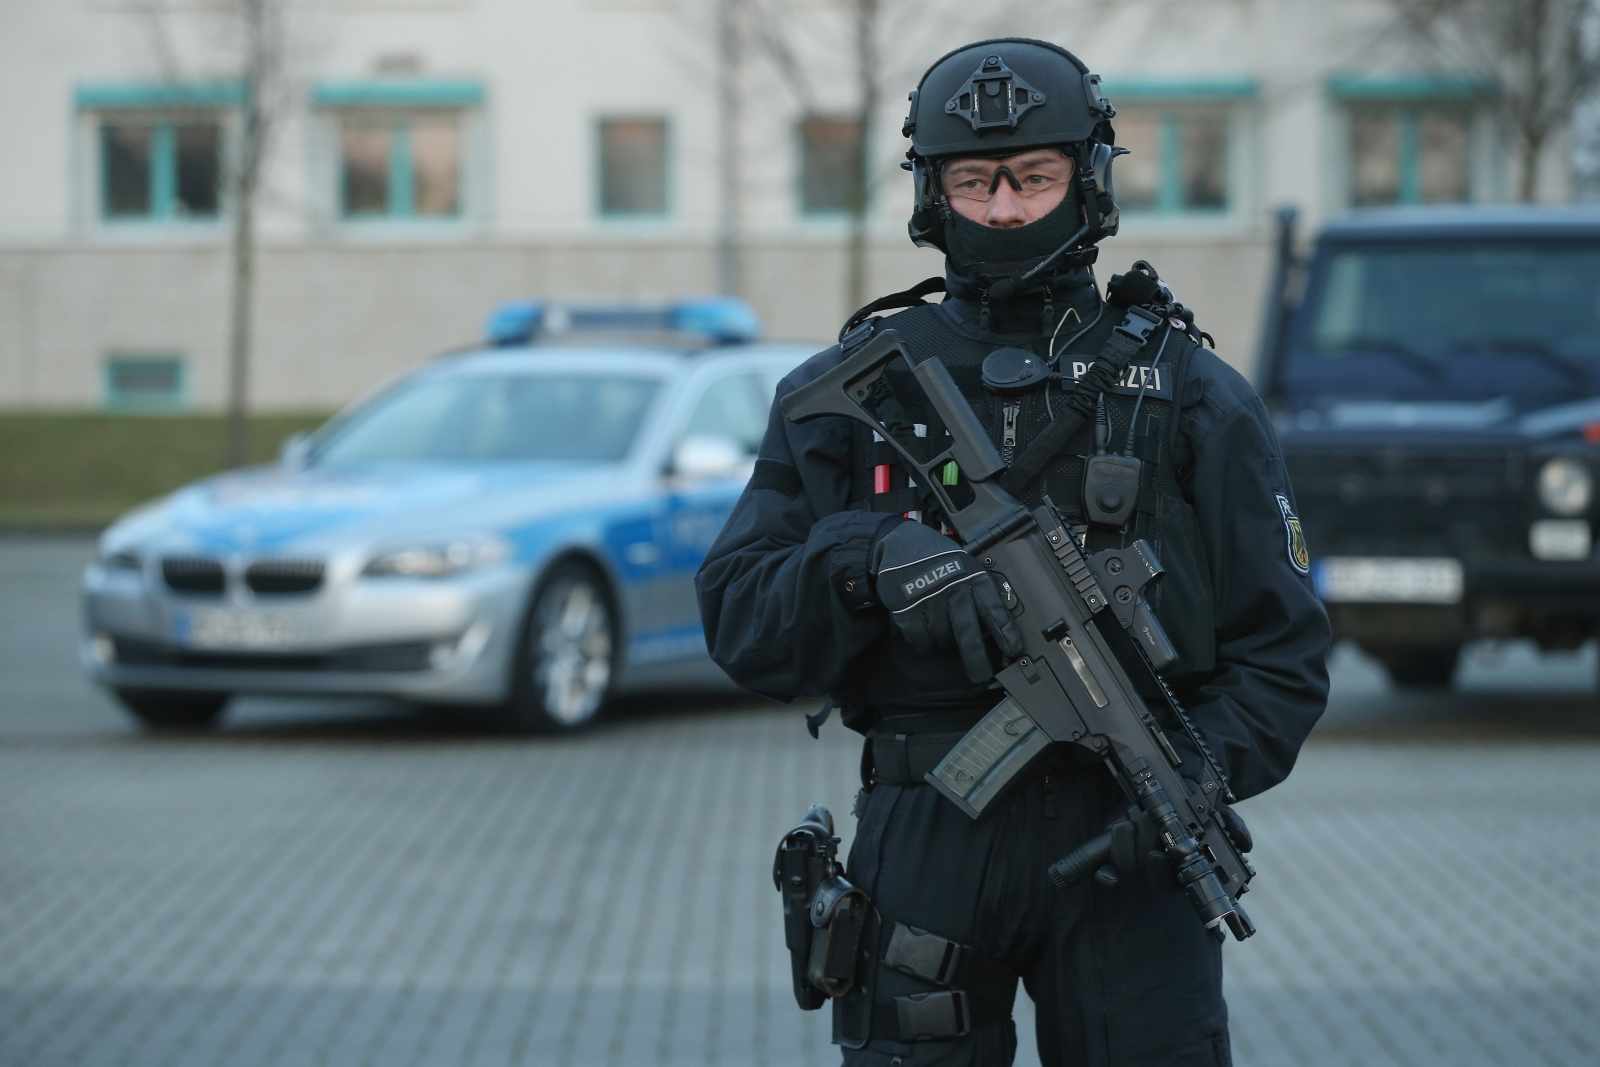 German anti-terror police